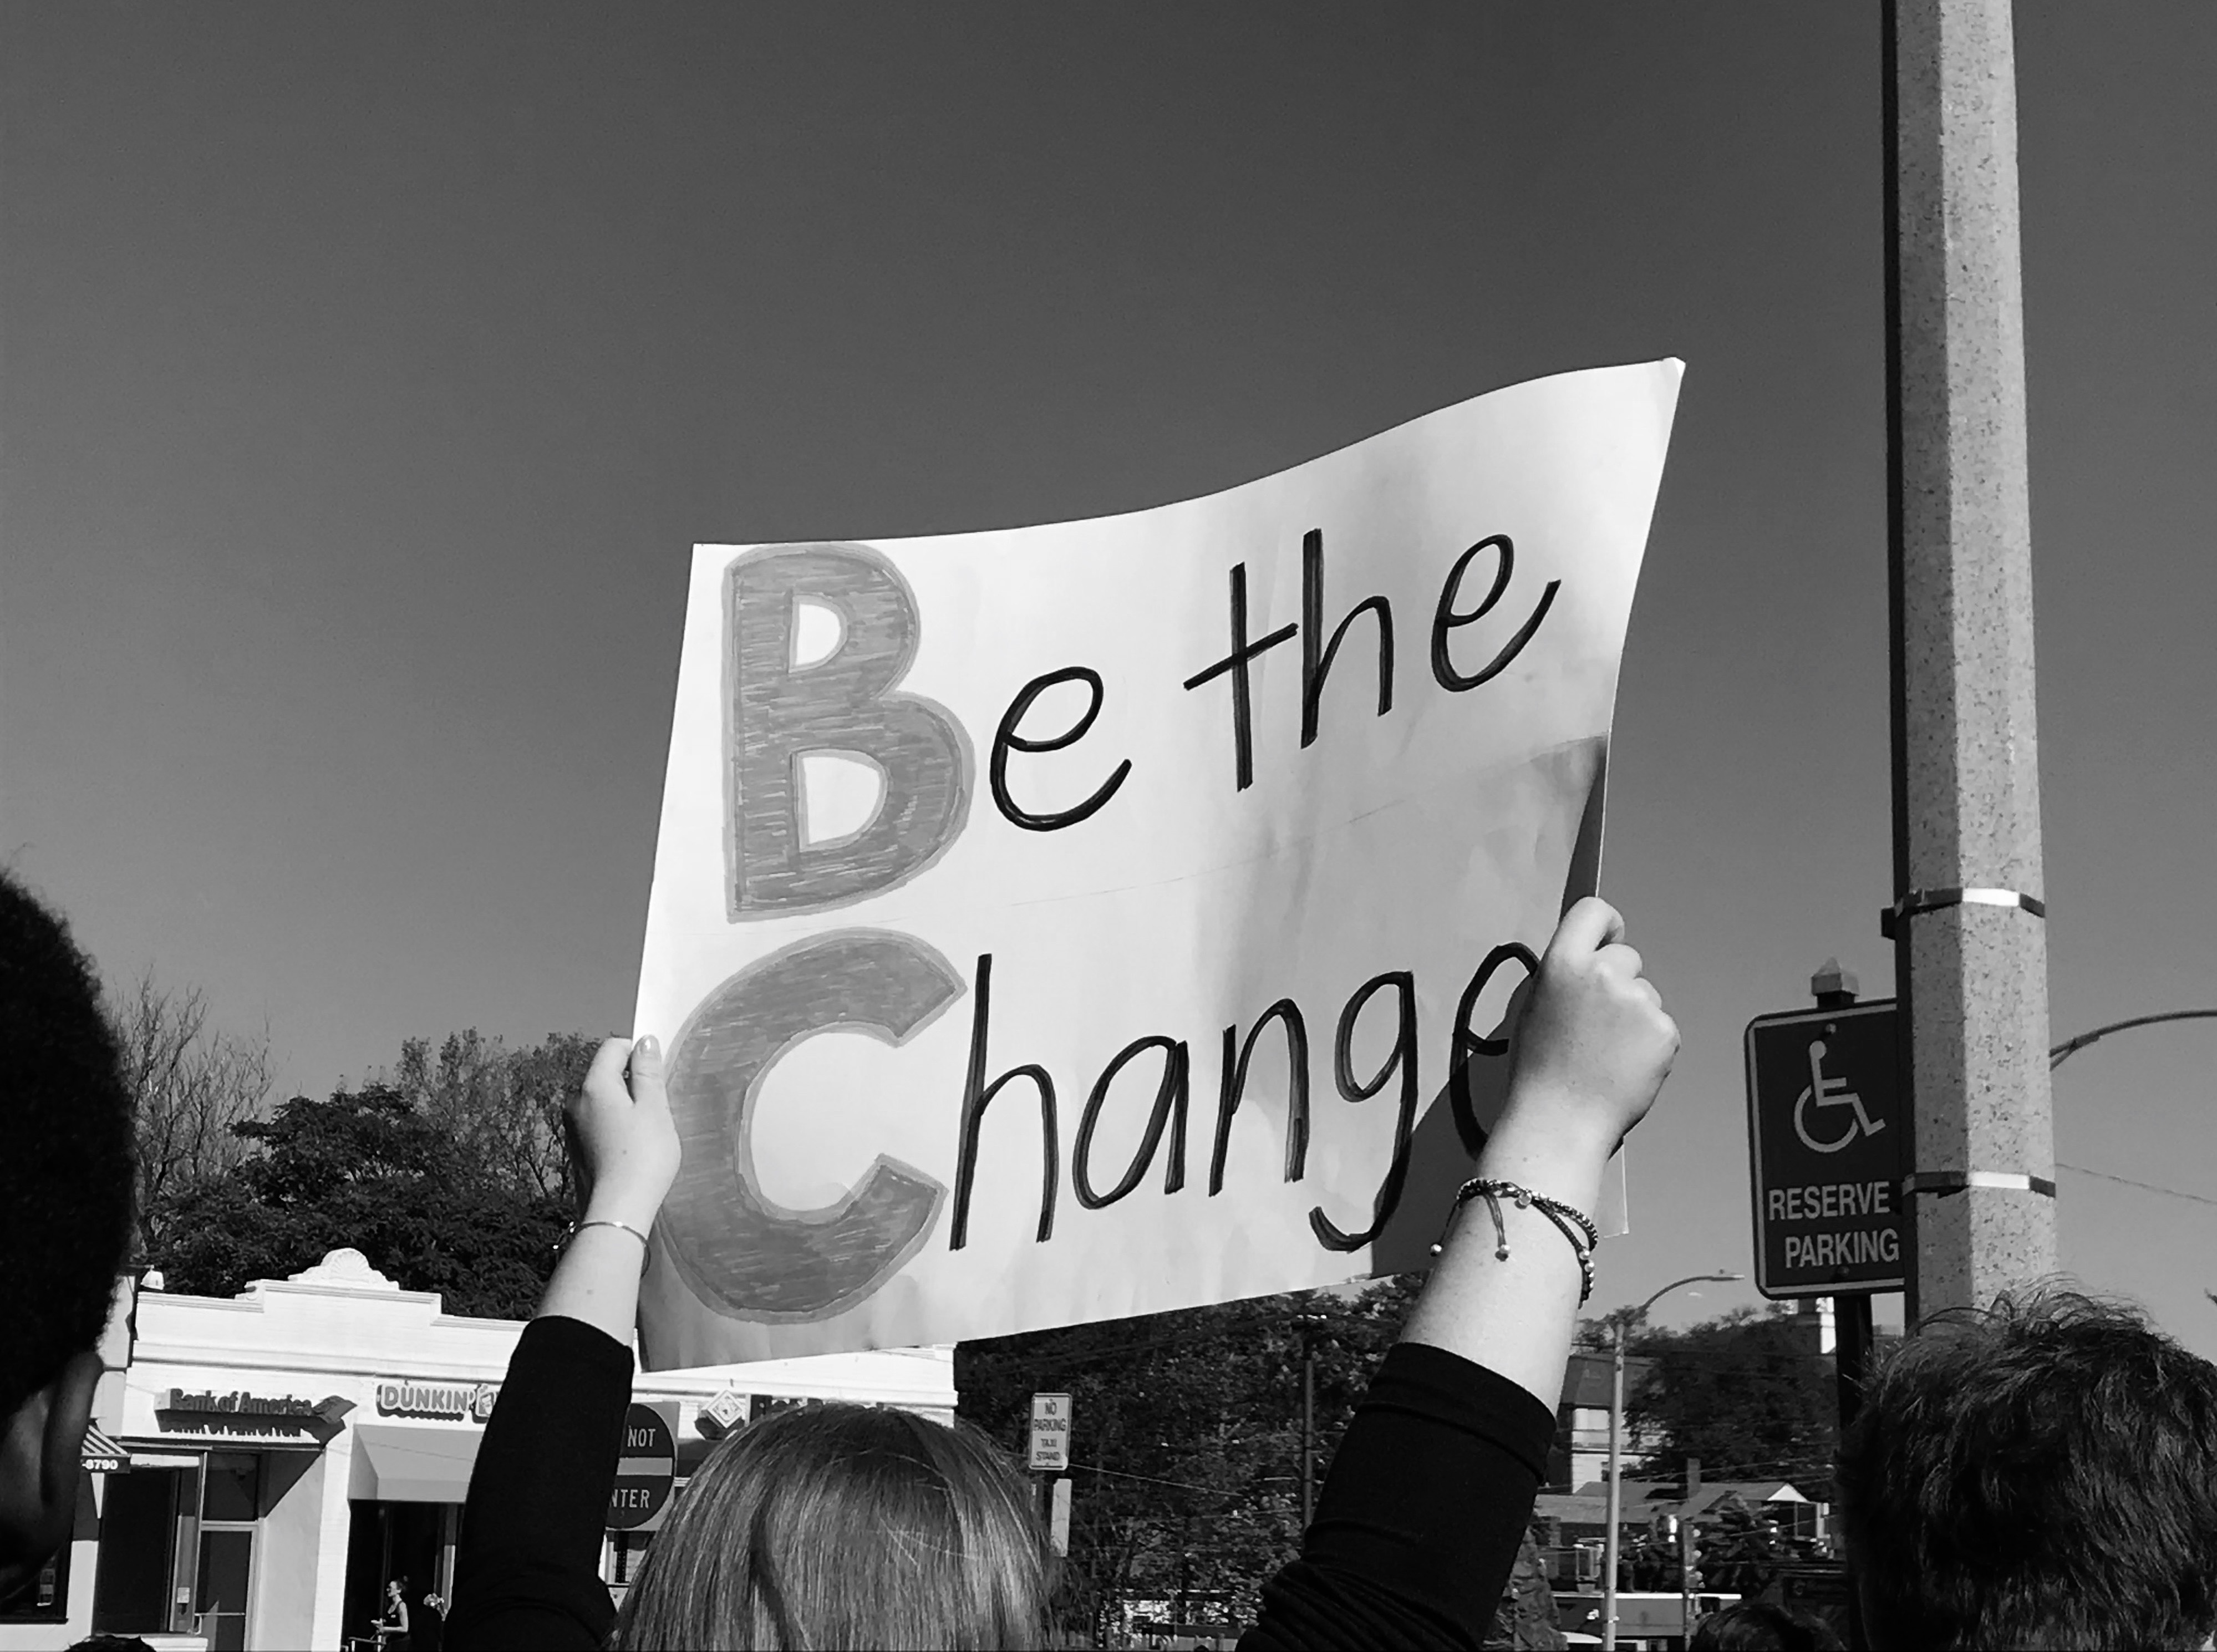 BC the Change - Rebecca Francesconi